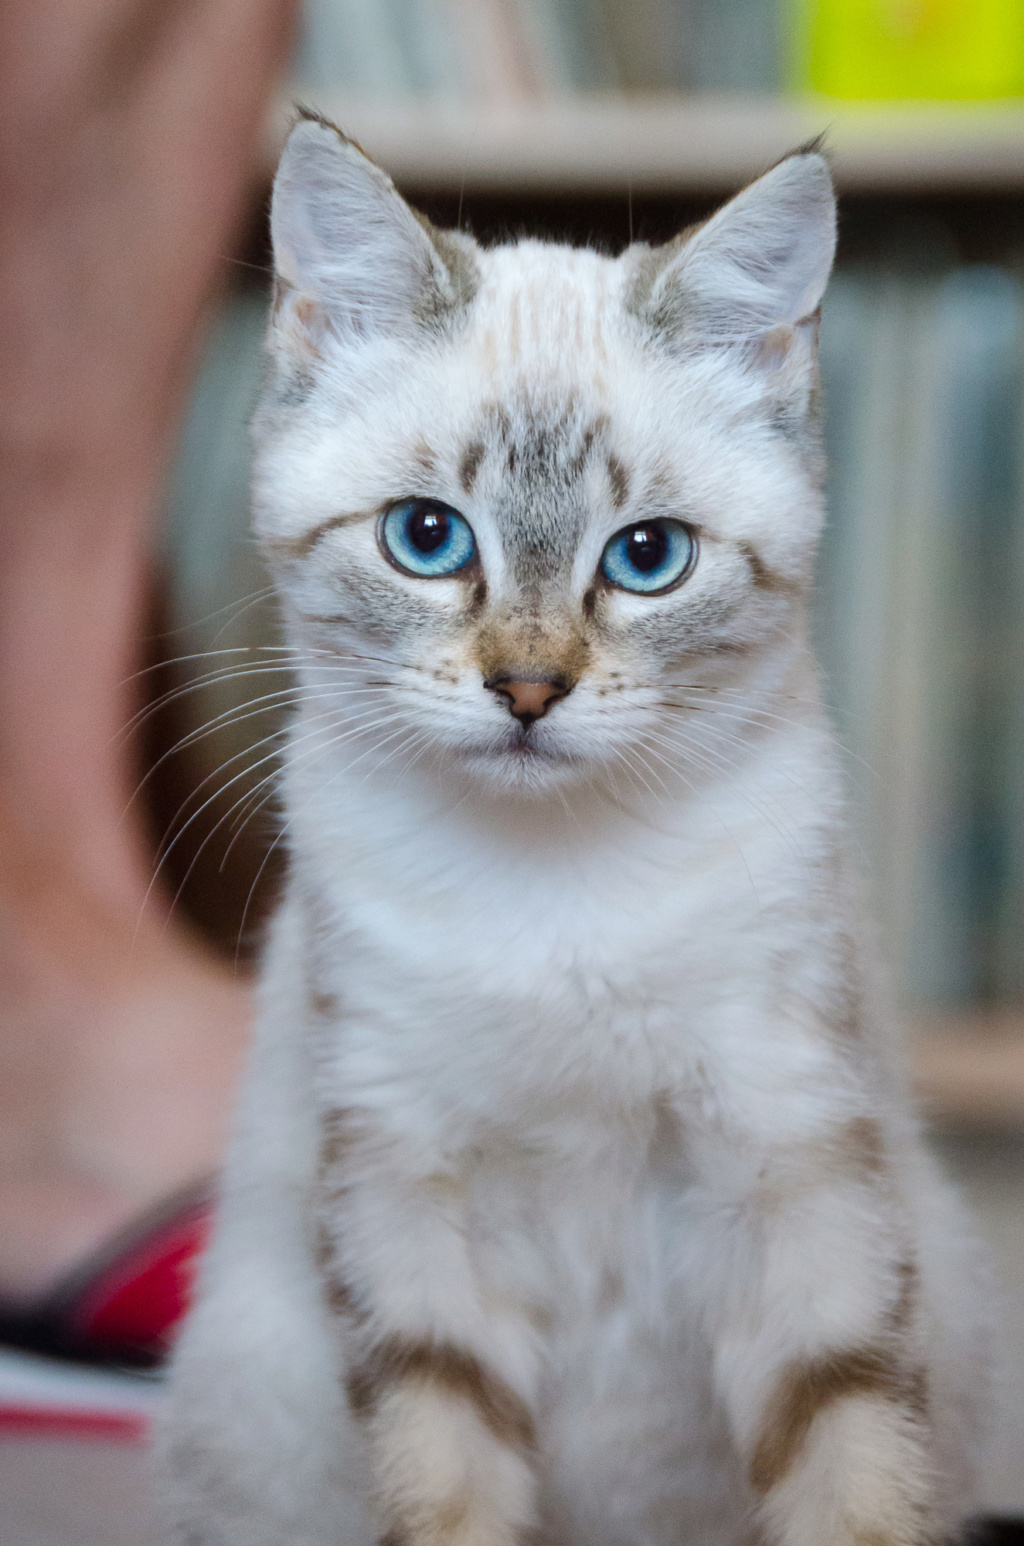 Perle, femelle type européenne x siamois tabby point estimée 1er juin 2019 Perle_15